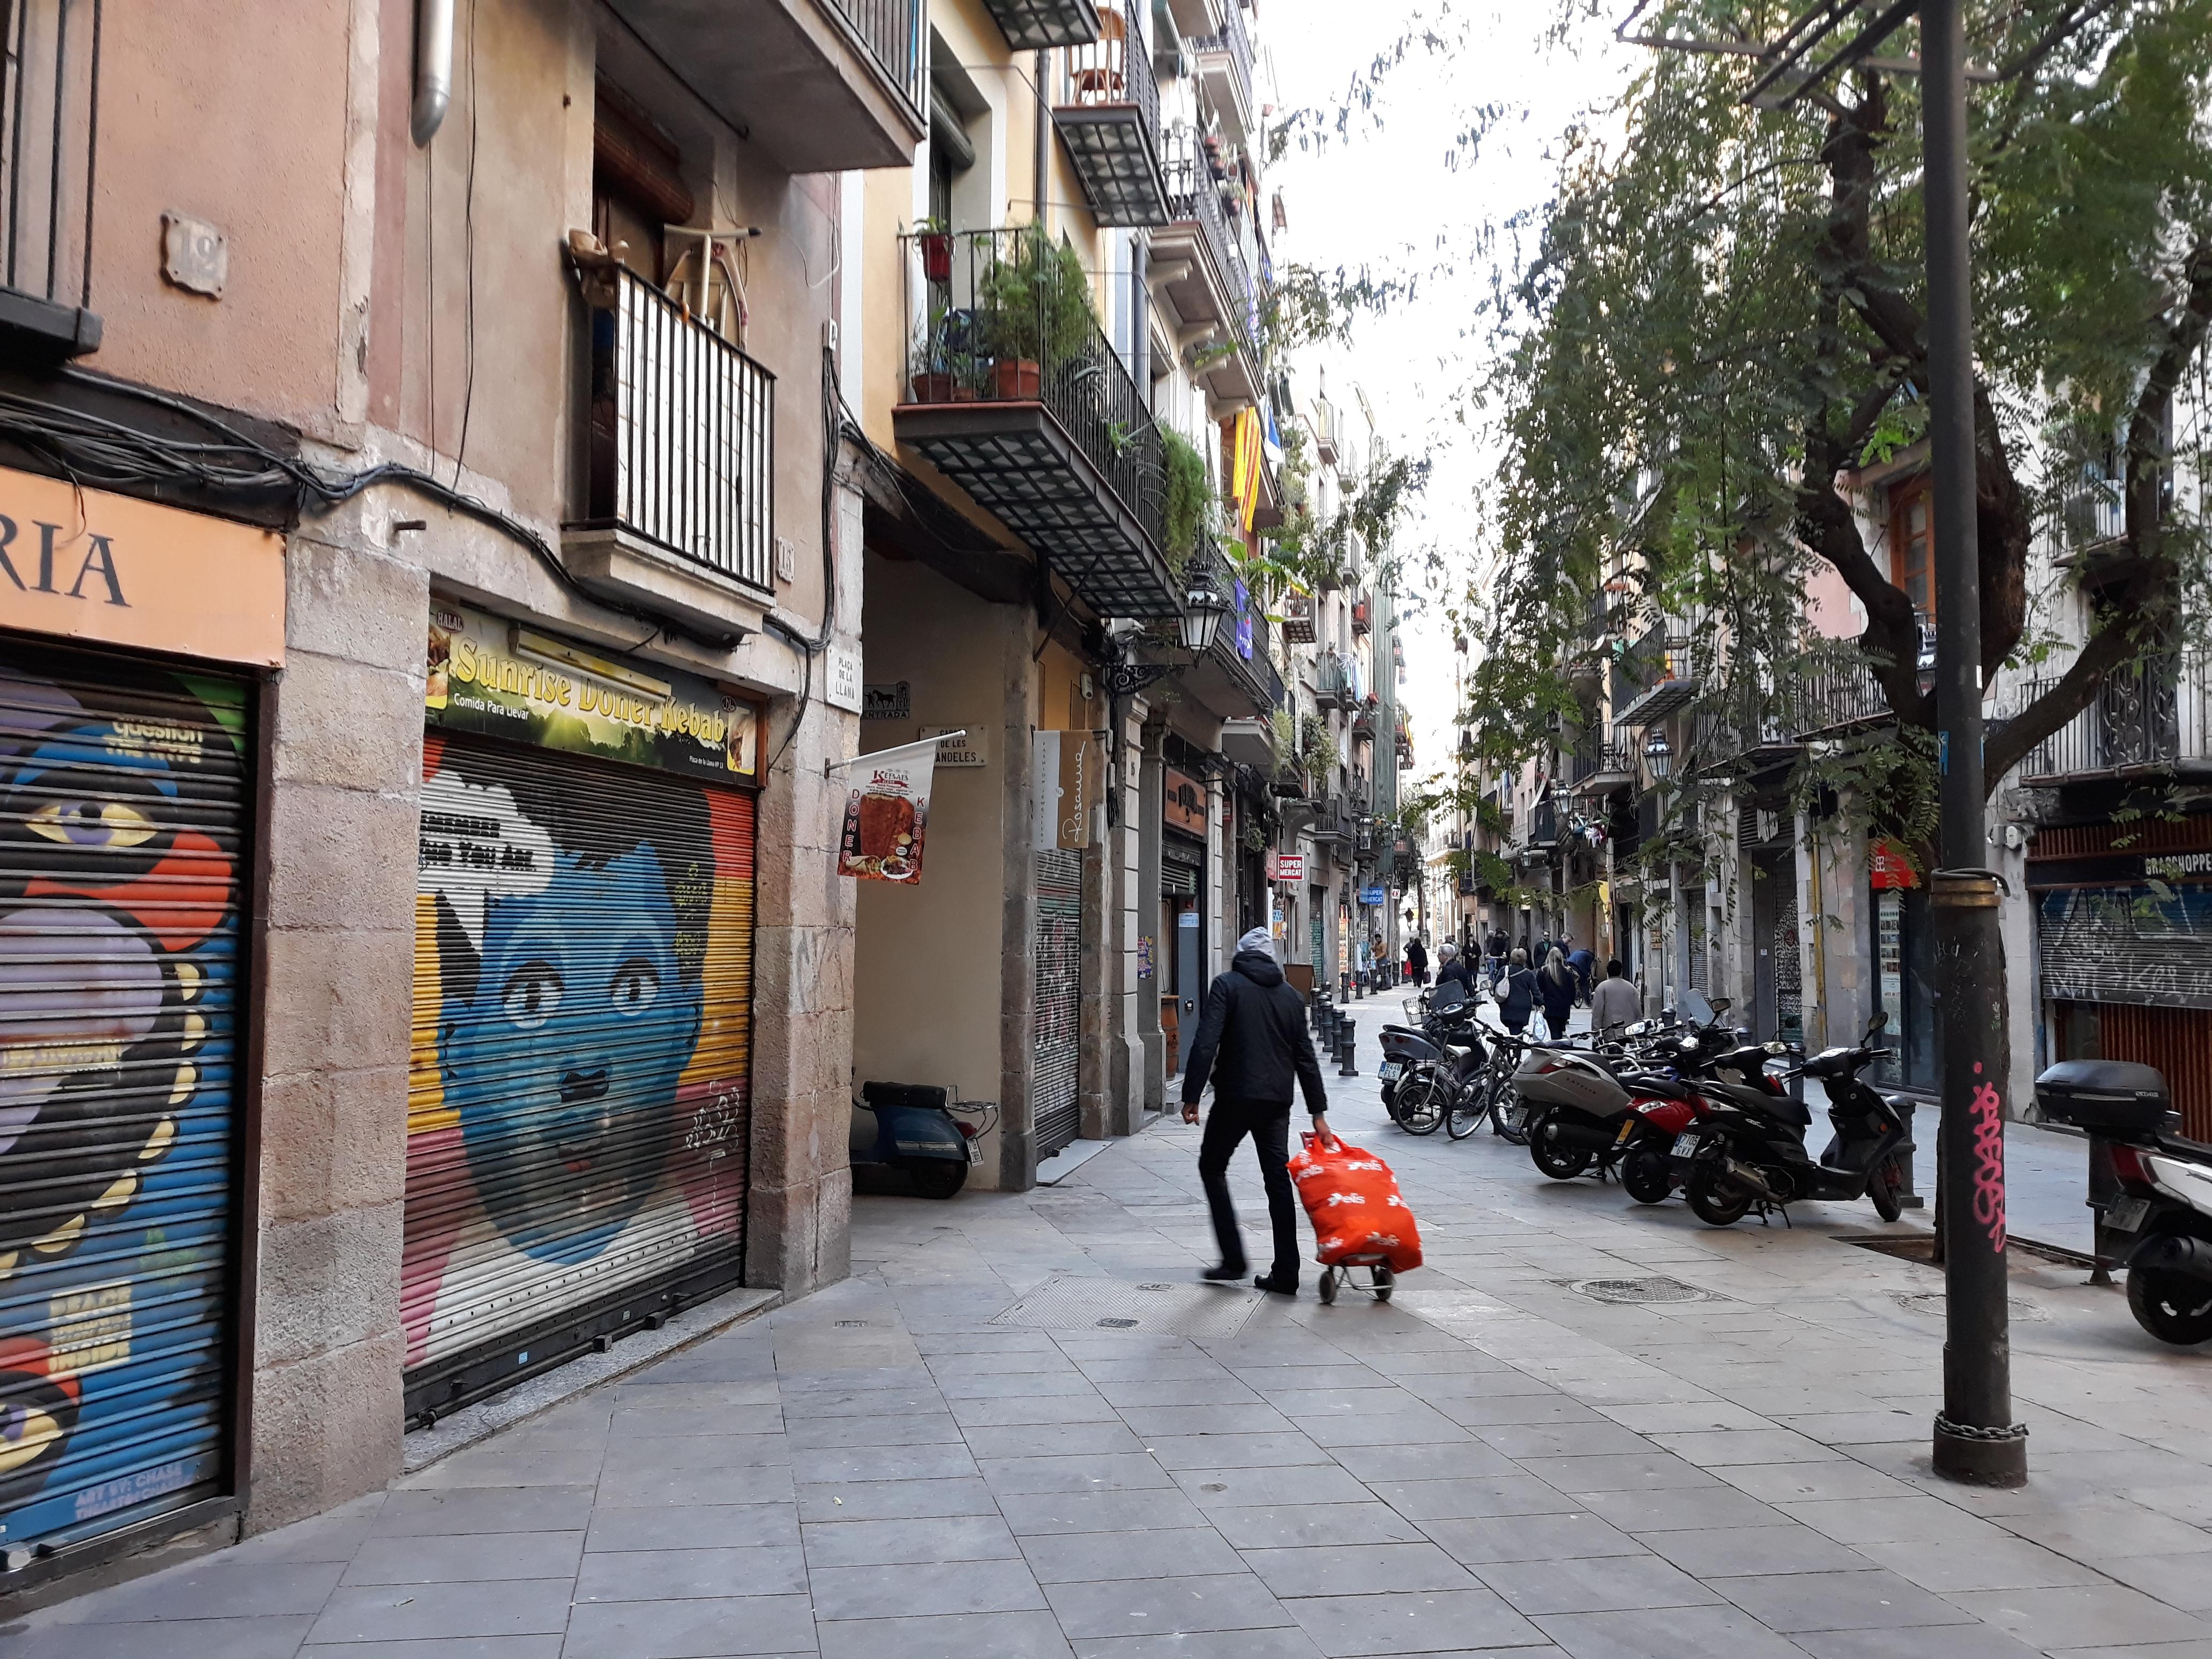 File:Plaça de la Llana 2.jpg - Wikimedia Commons